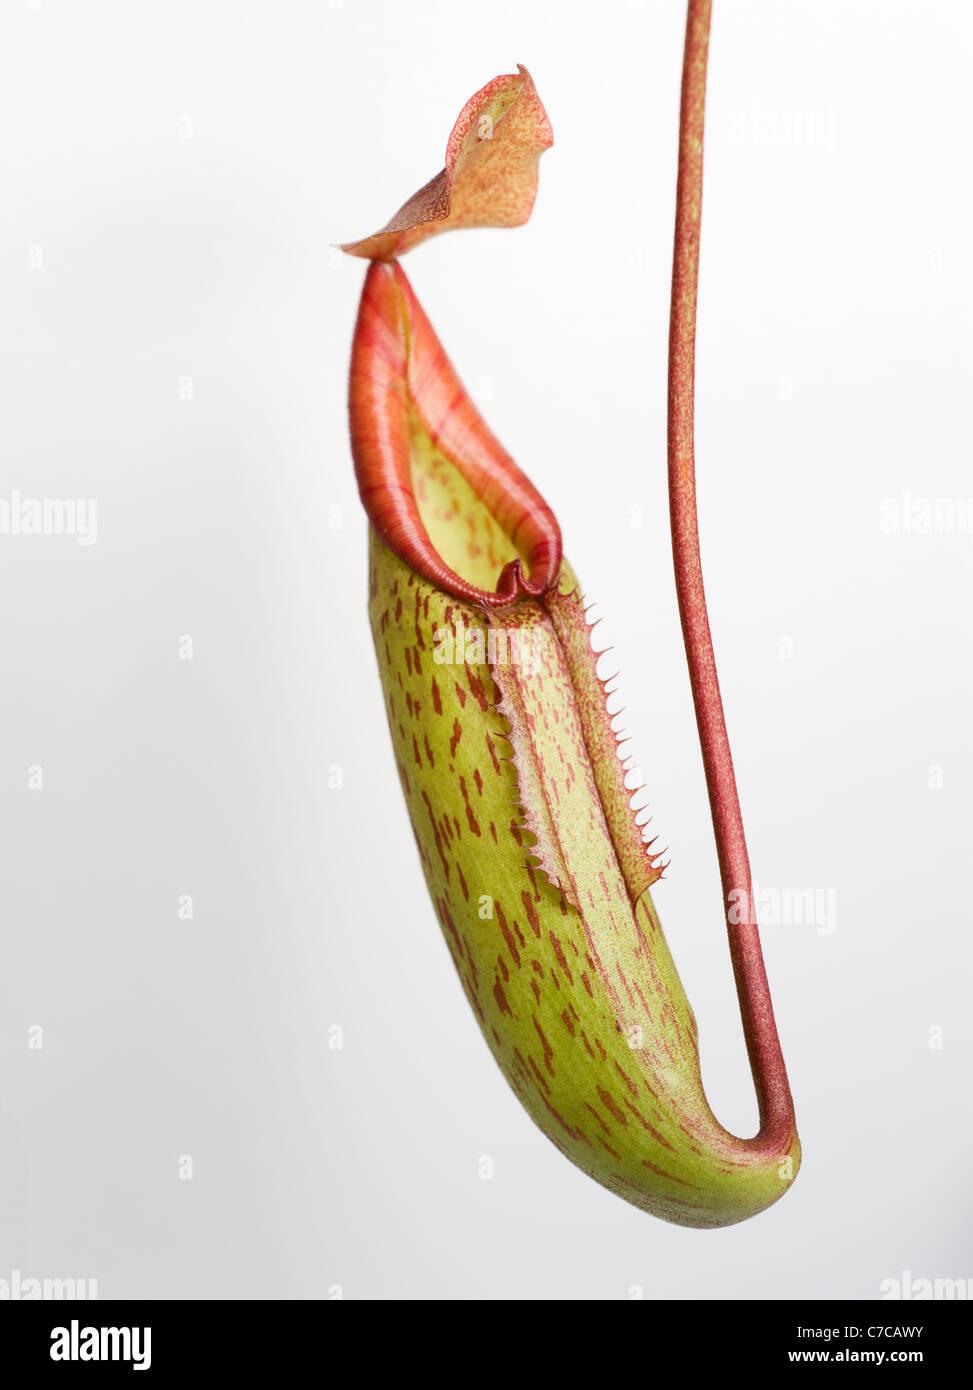 Carnivorous Pitcher Plant - Stock Image